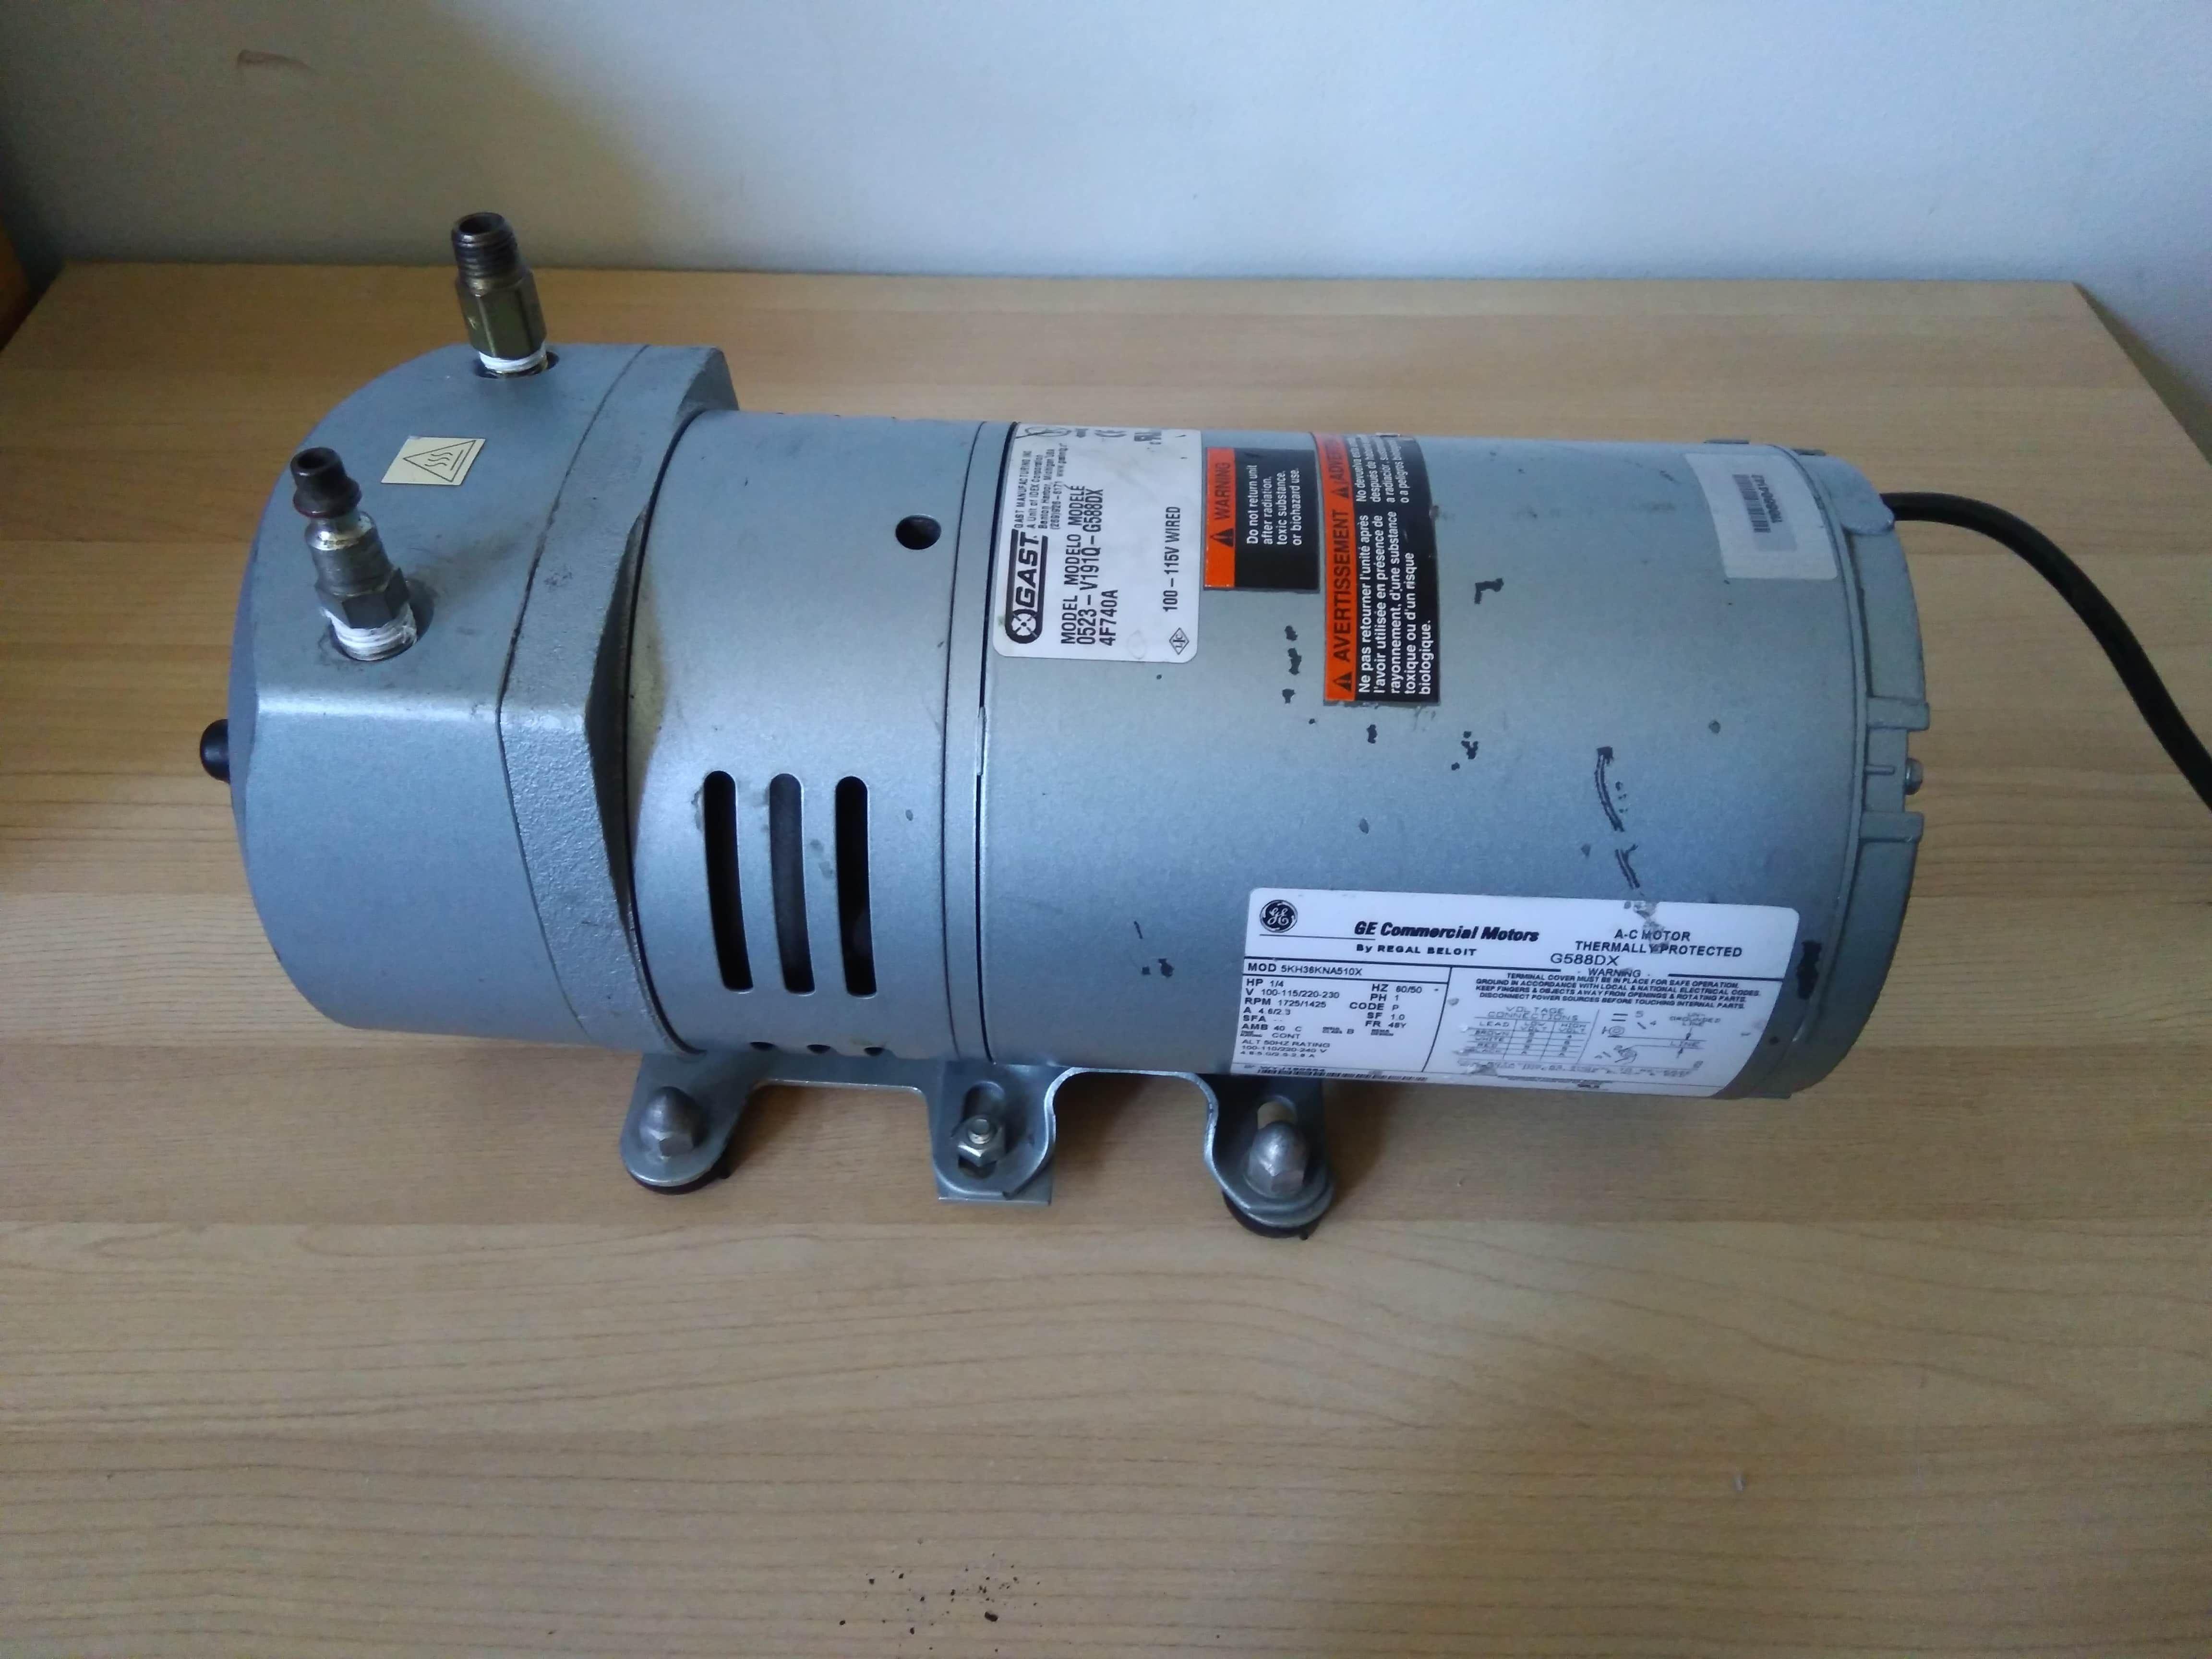 GAST Vacuum Rotary Vane Pump 0523 1/4 HP 1725/1425 rpm